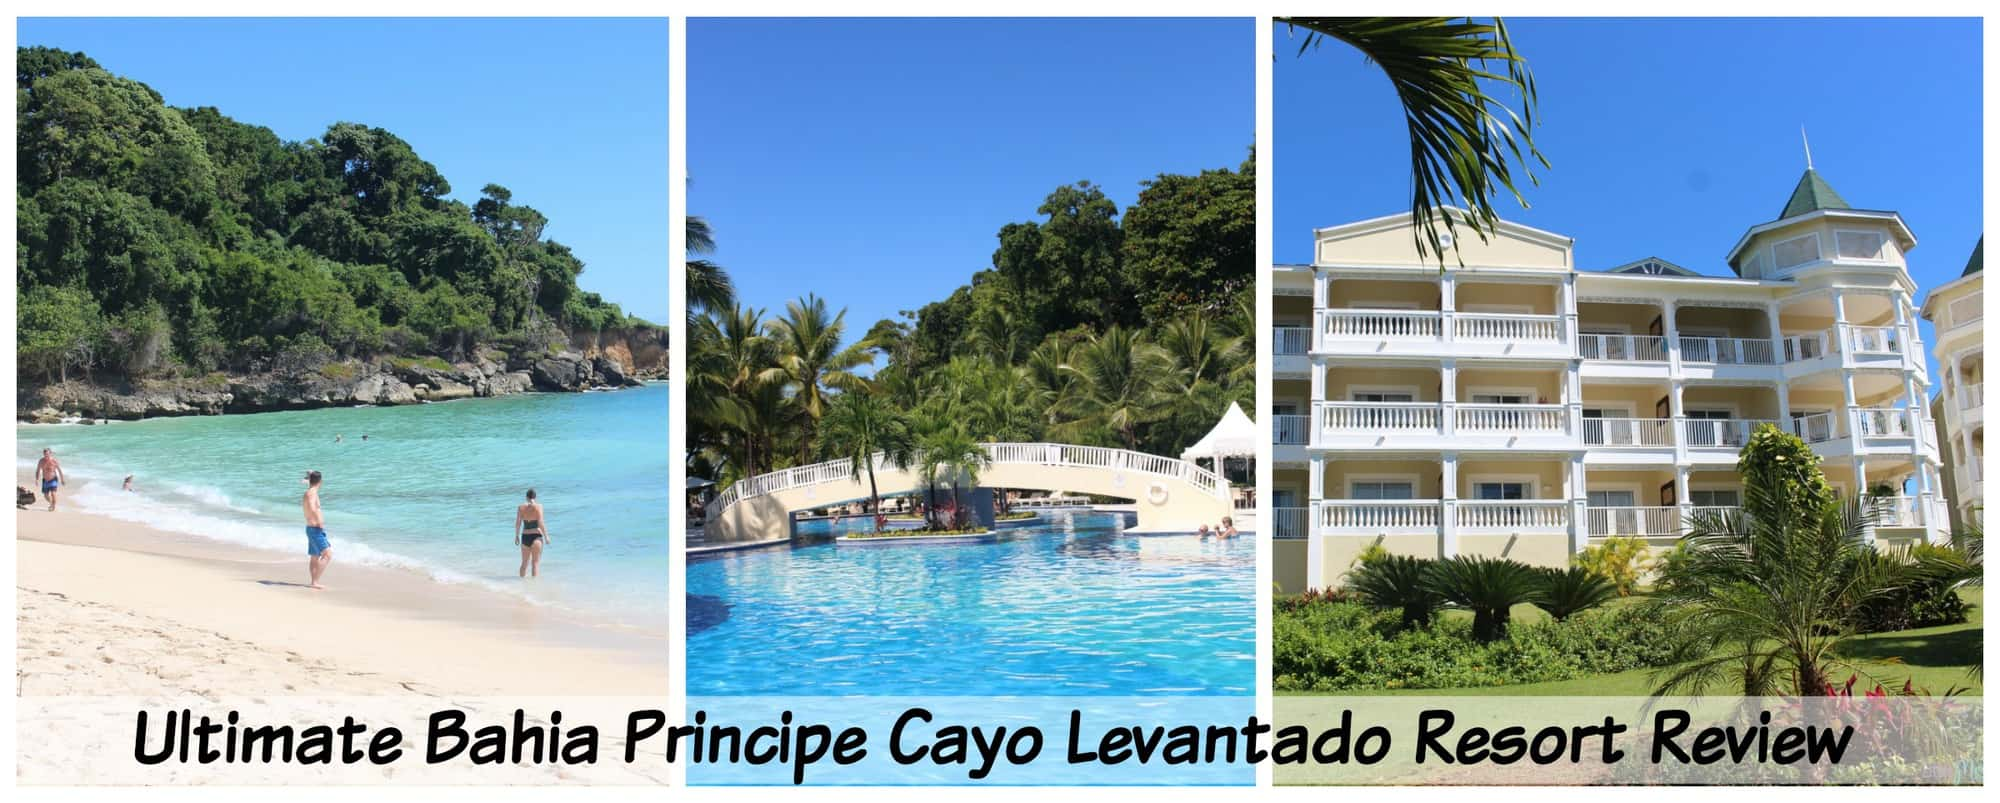 Ultimate Bahia Principe Cayo Levantado Resort Review – The Hotel, Restaurants, Pools